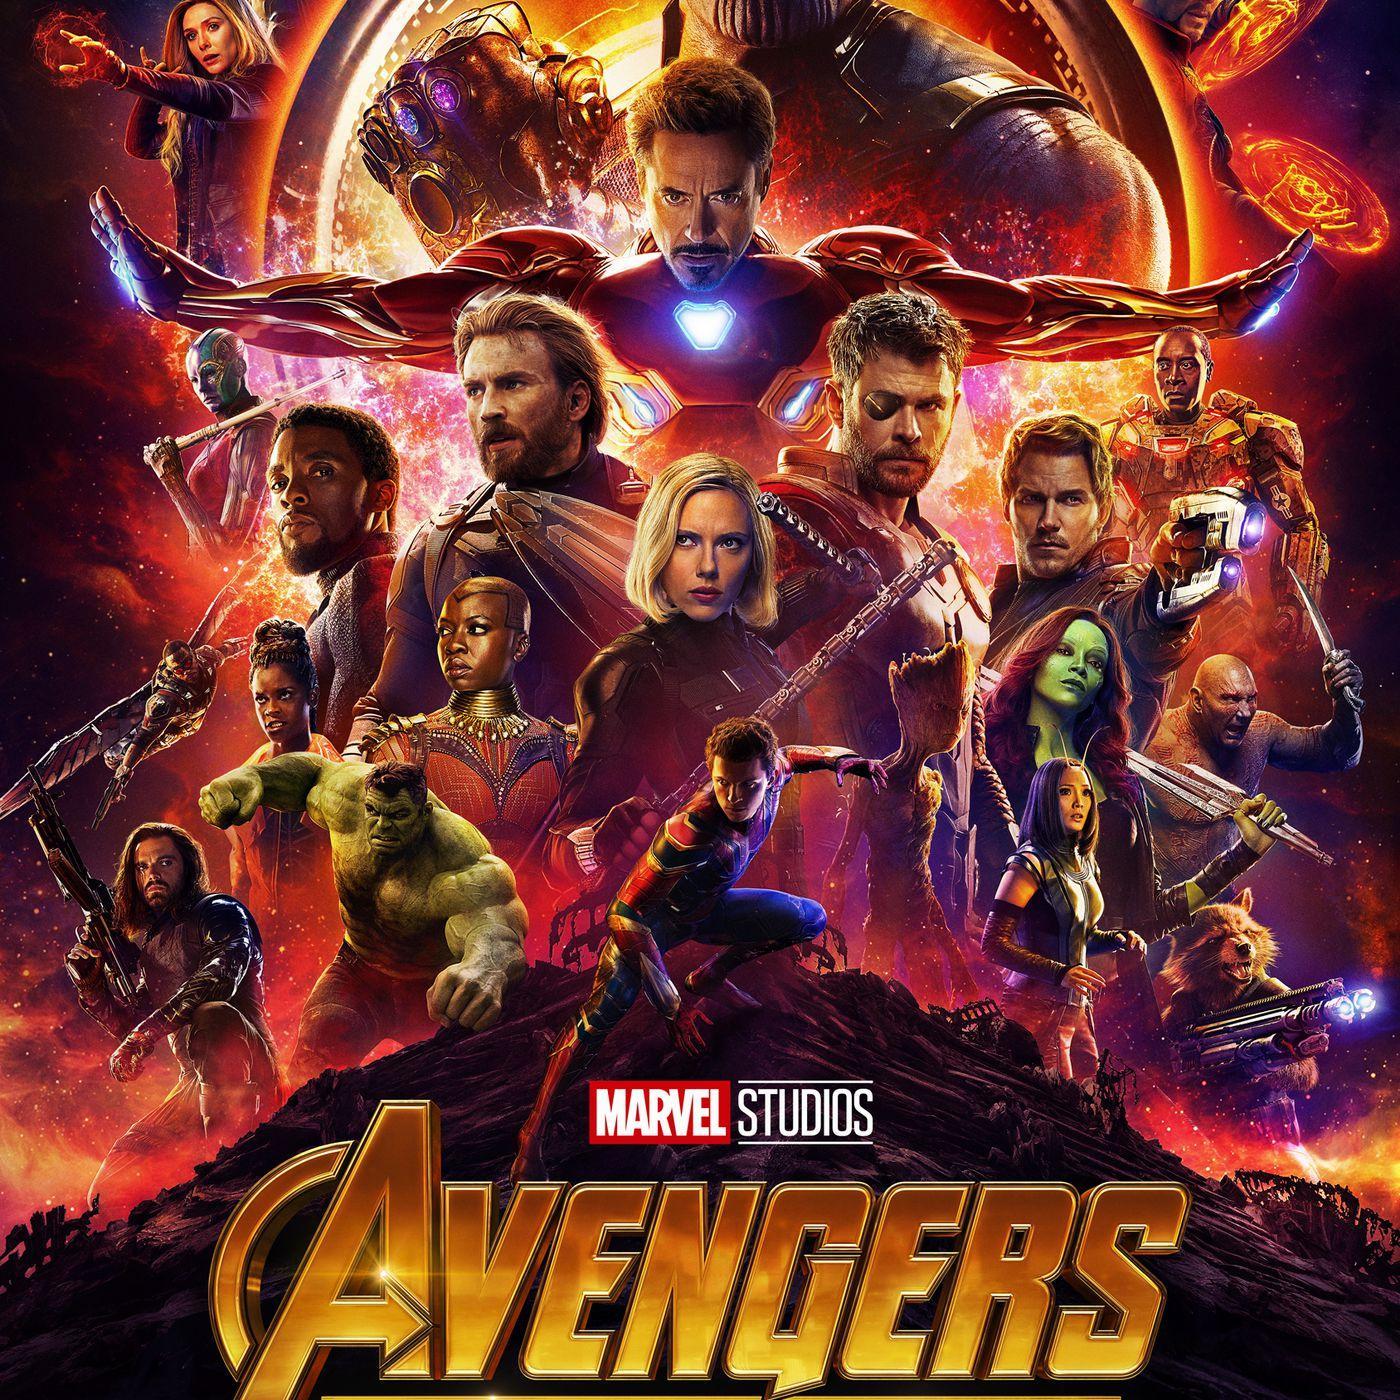 Avengers Endgame Cast Wallpapers Wallpaper Cave